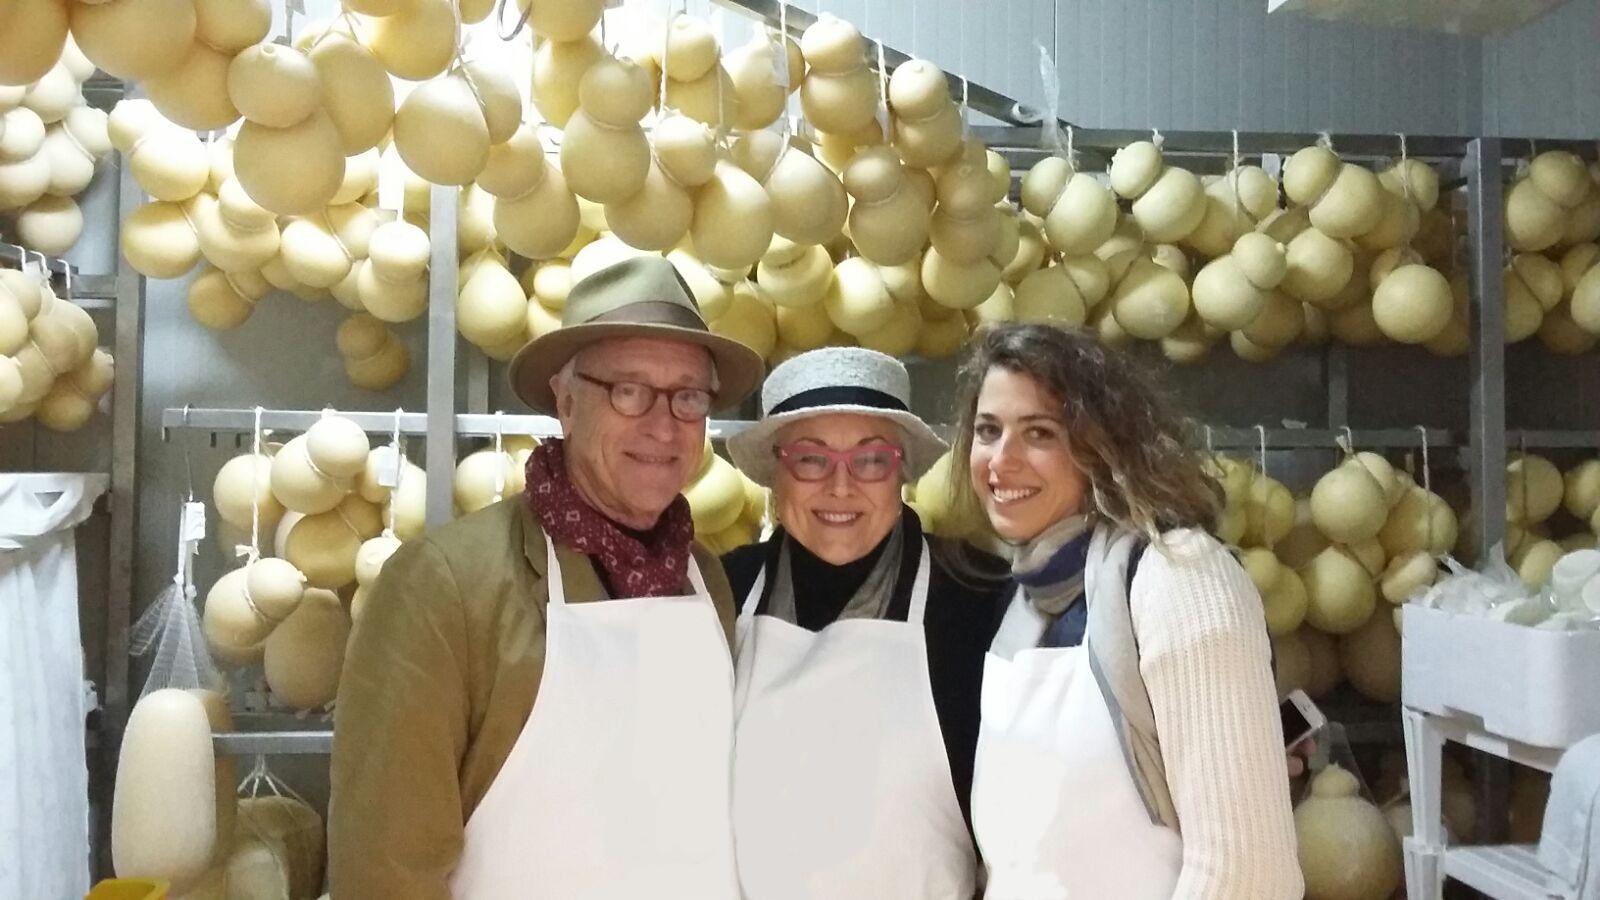 Sud-Est Apulia Salento PugliaCheese Dairy